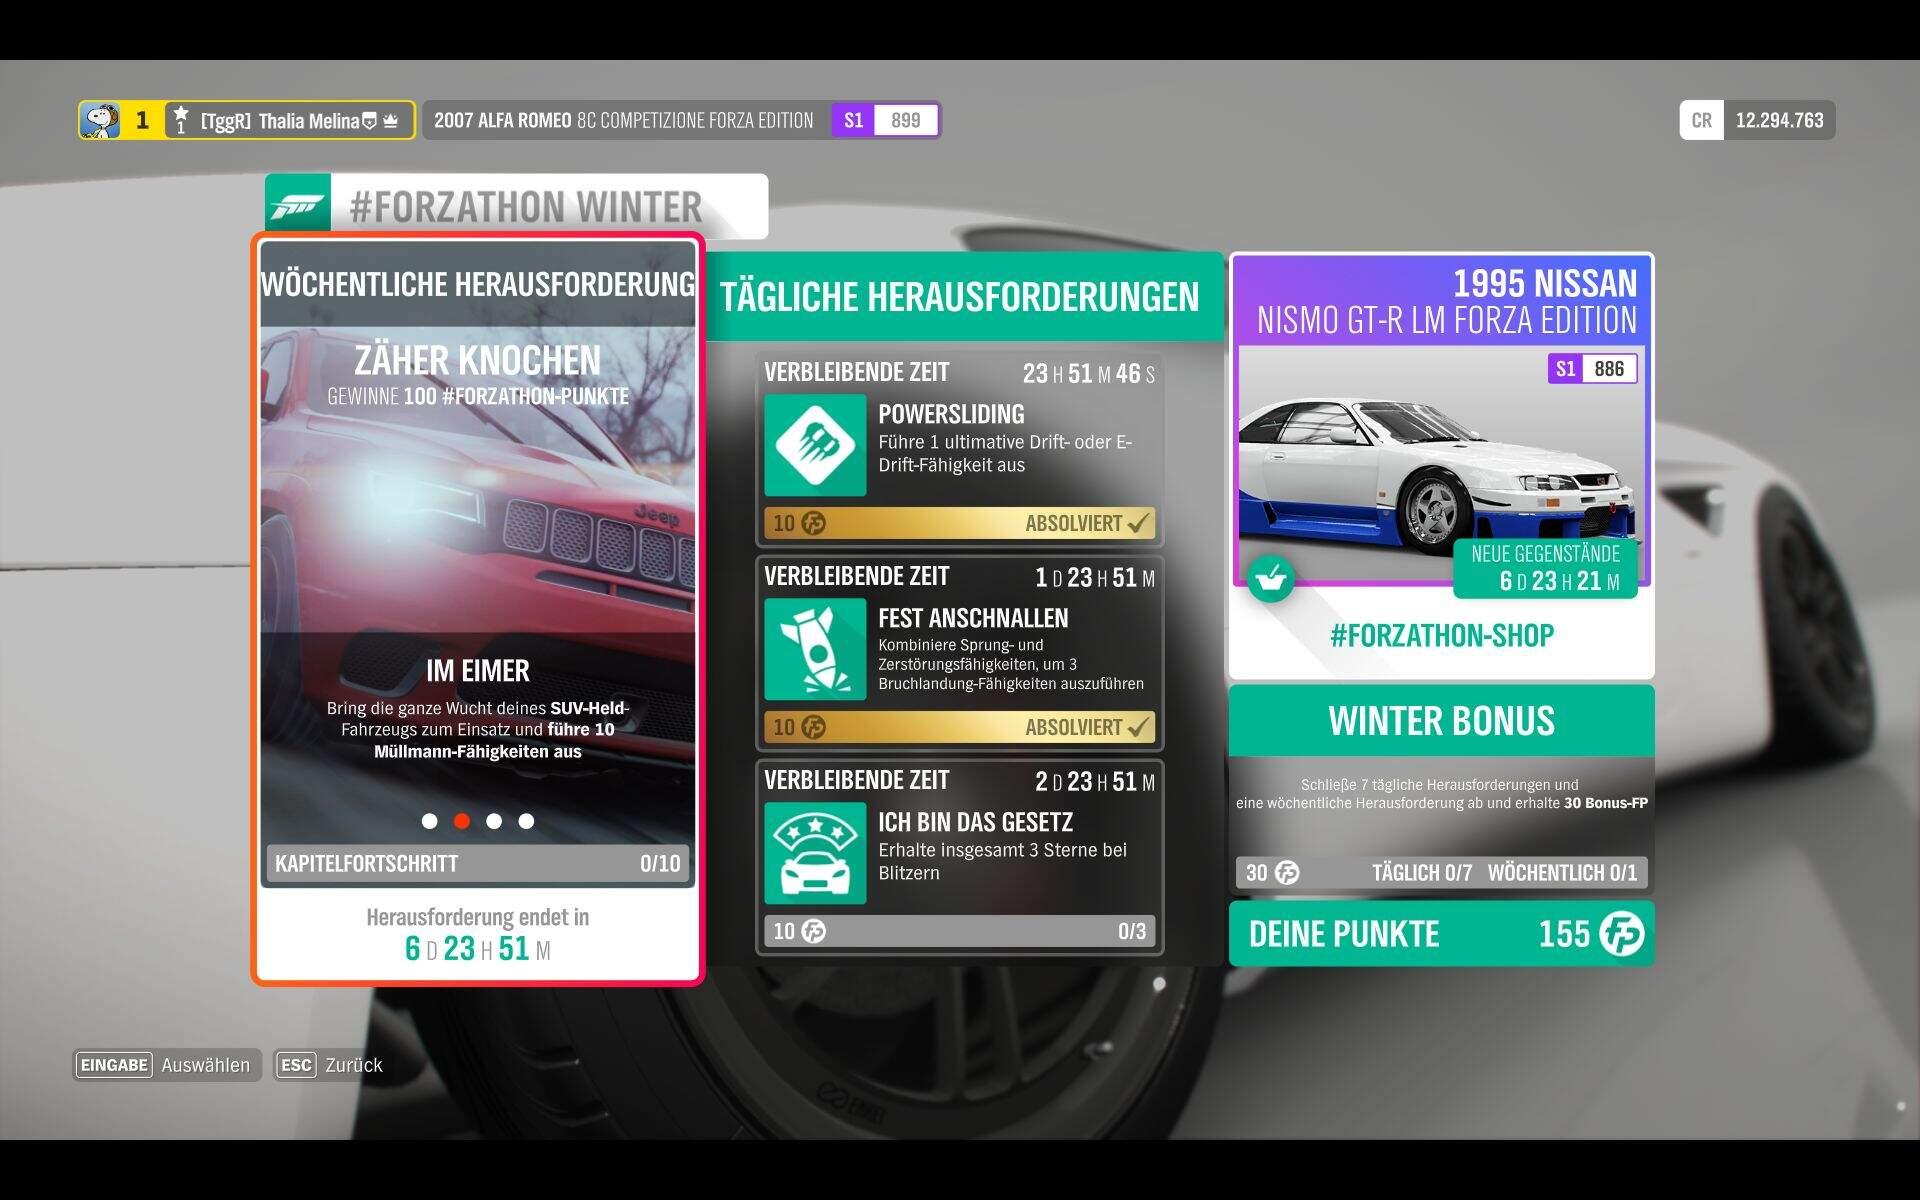 Forza Horizon 4 #Forzathon Guide KW 45 – Zäher Knochen